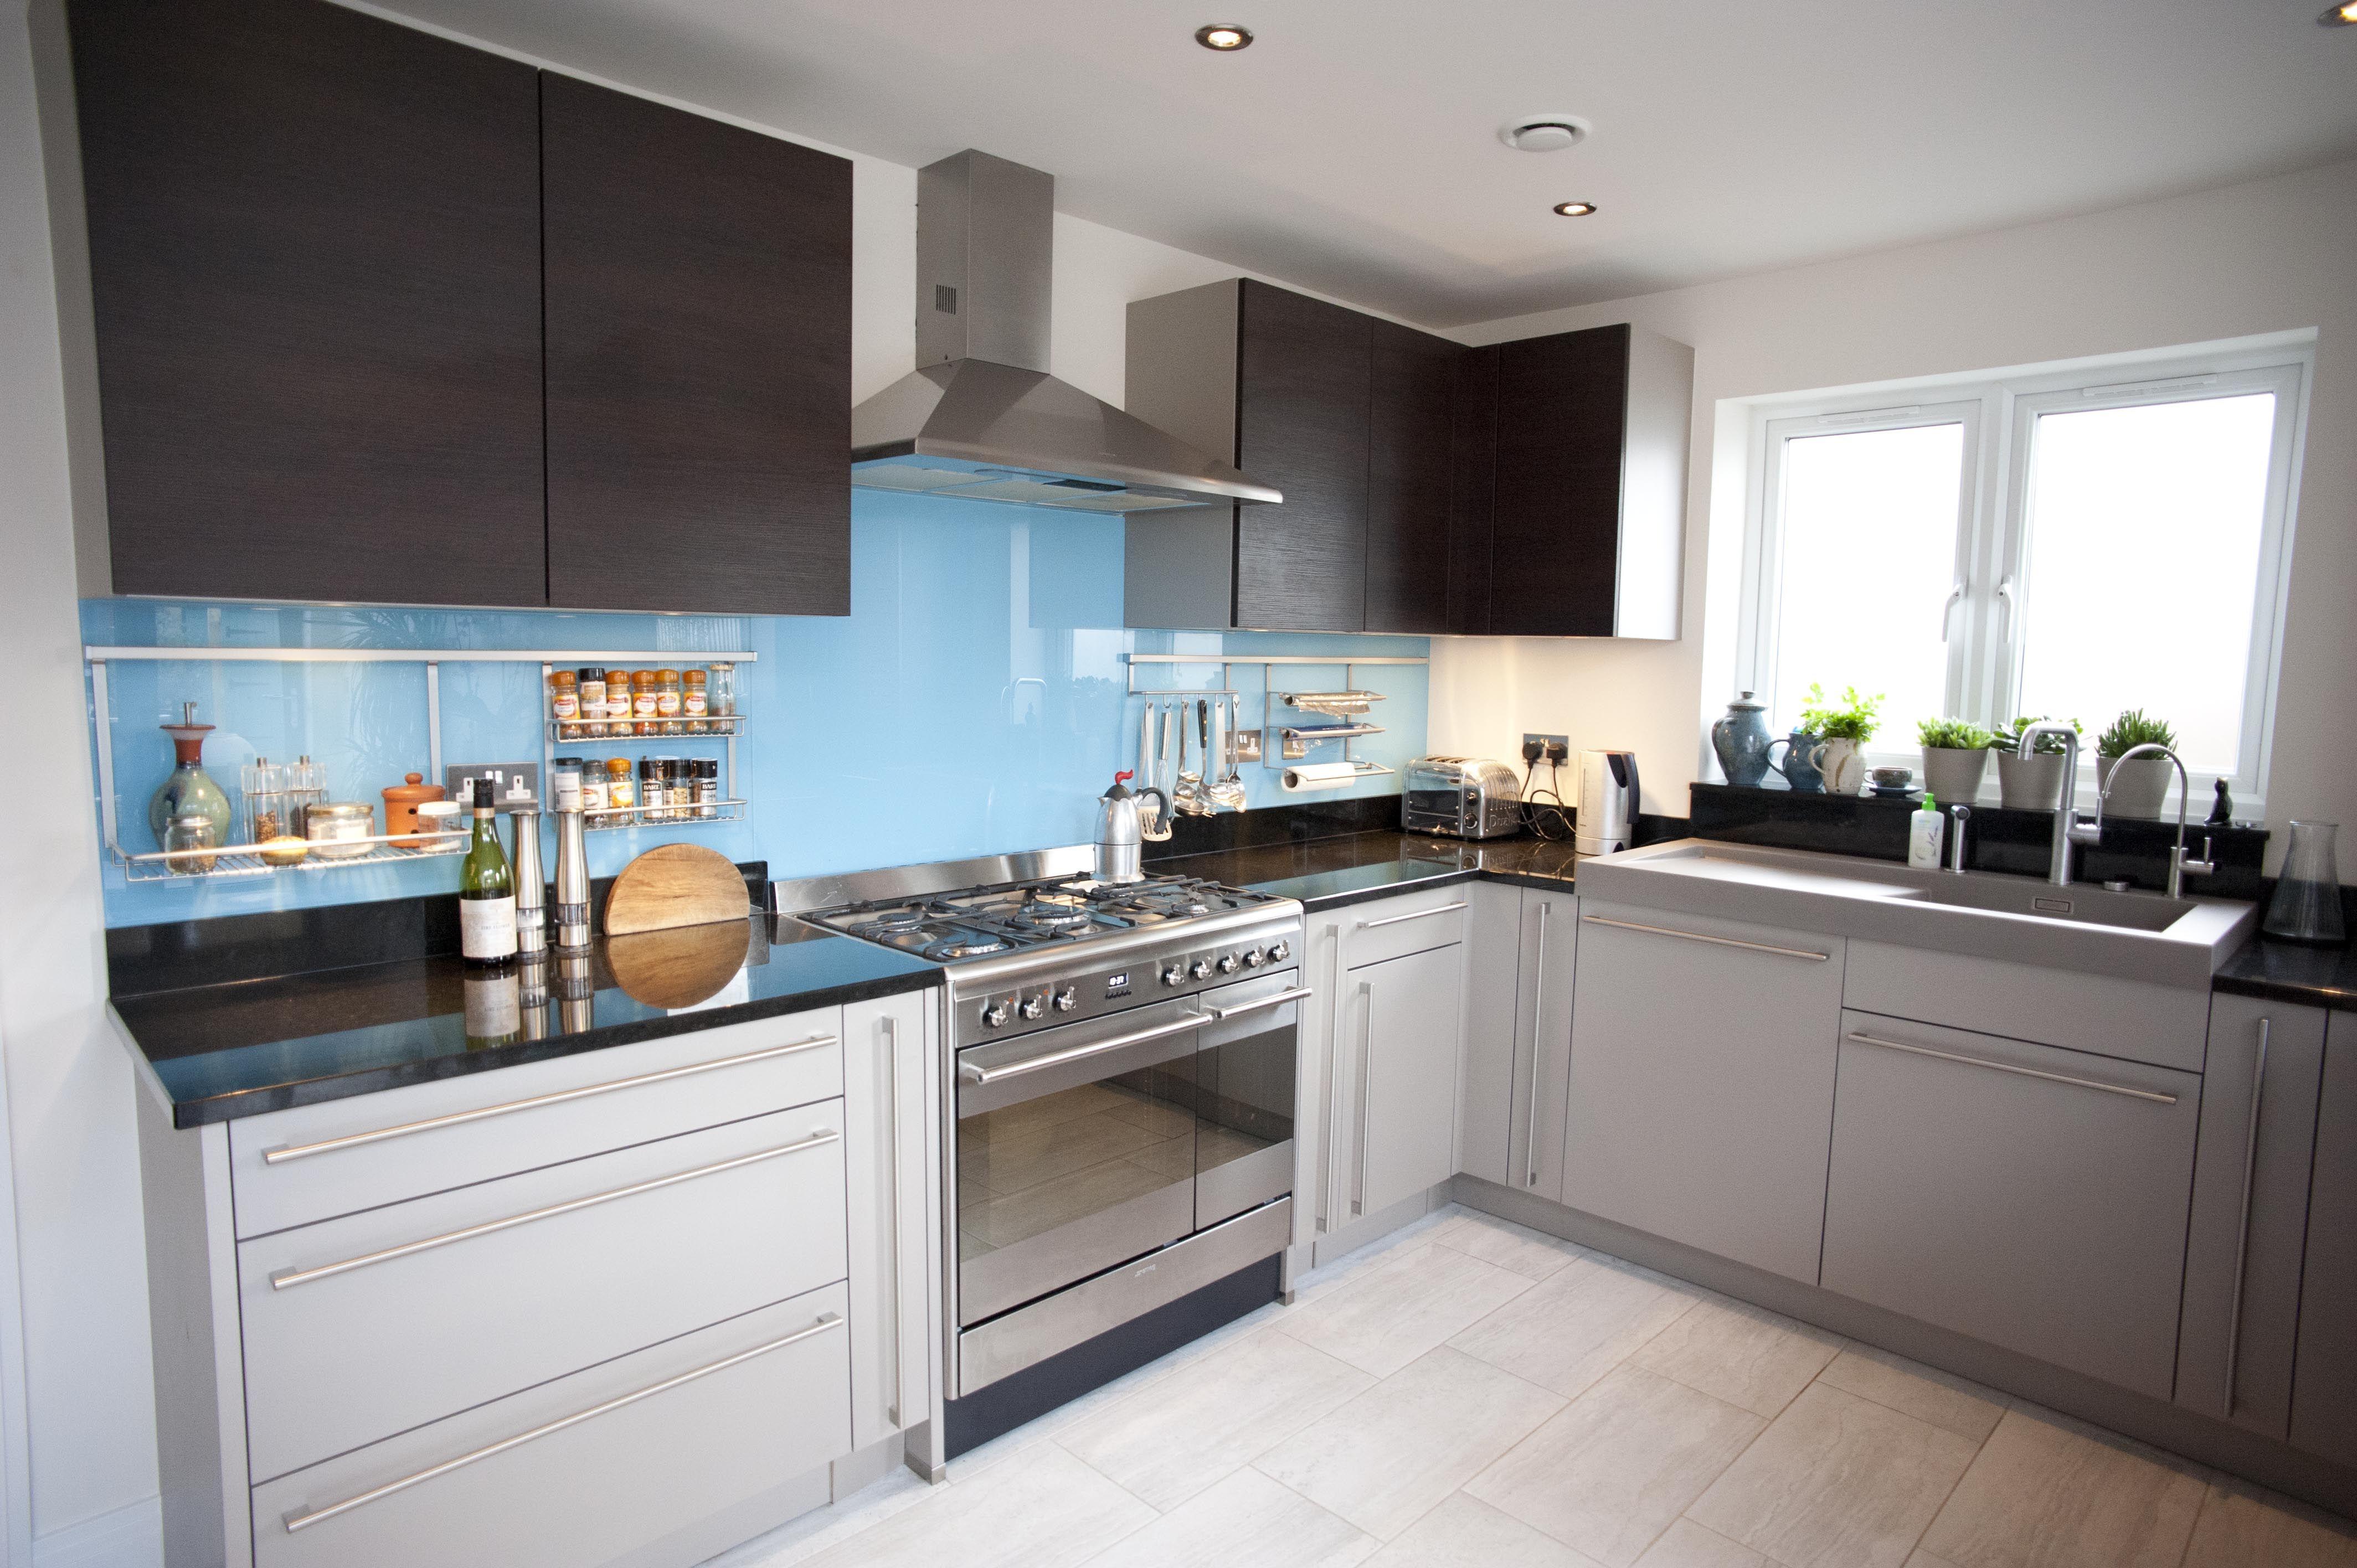 Nolte Kitchens | Glass splashbacks, Kitchens and Kitchen splashback ...